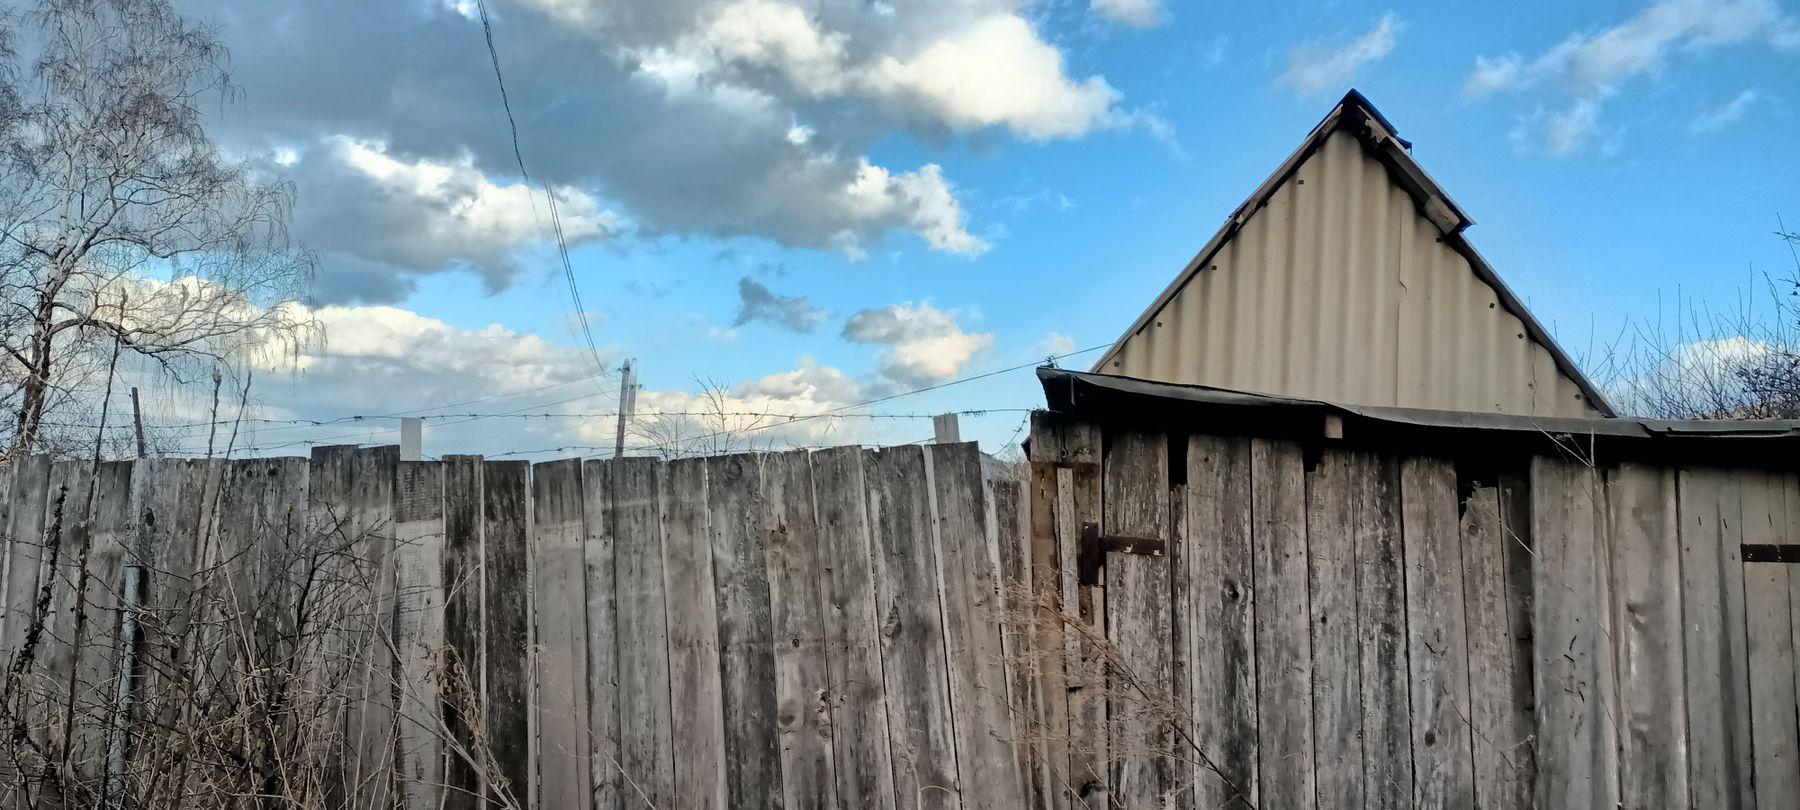 Забор Забор крыша дом деревня весна небо